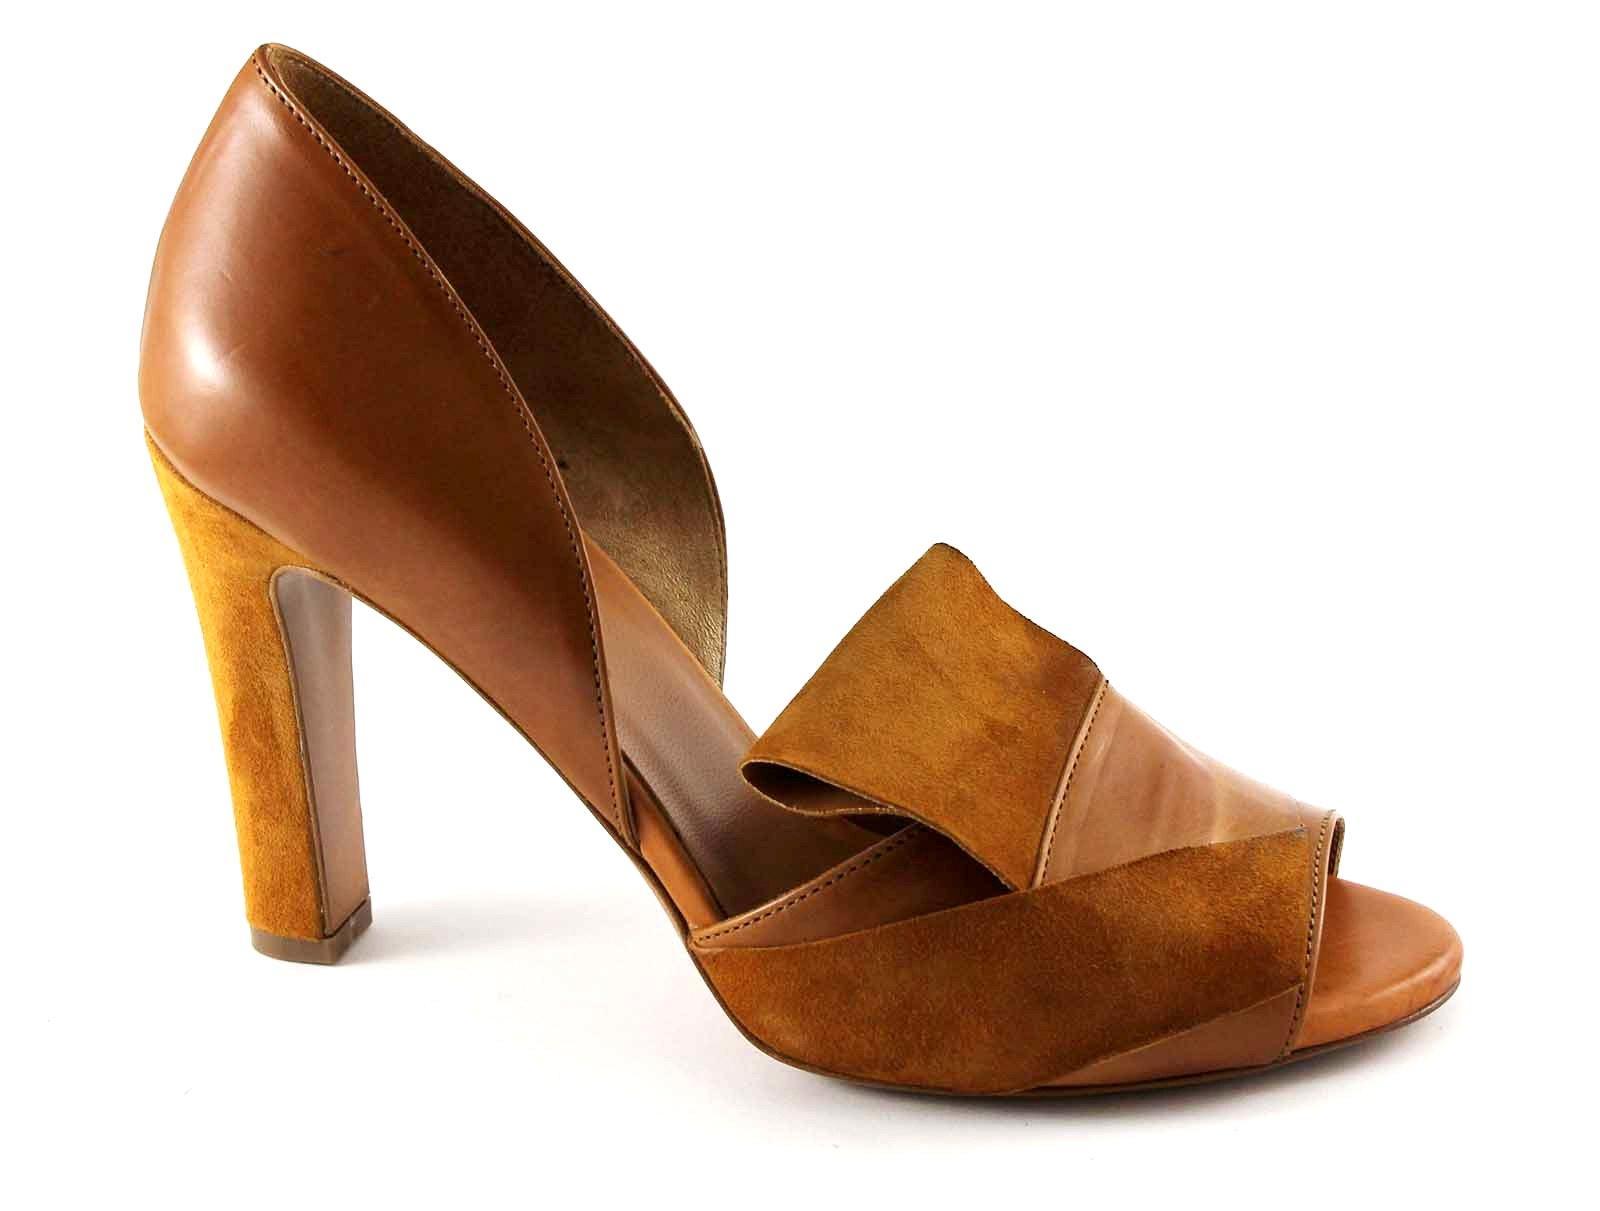 Sandali Giorgio Armani 41 Neri Strass Sandals Shoes Scarpe